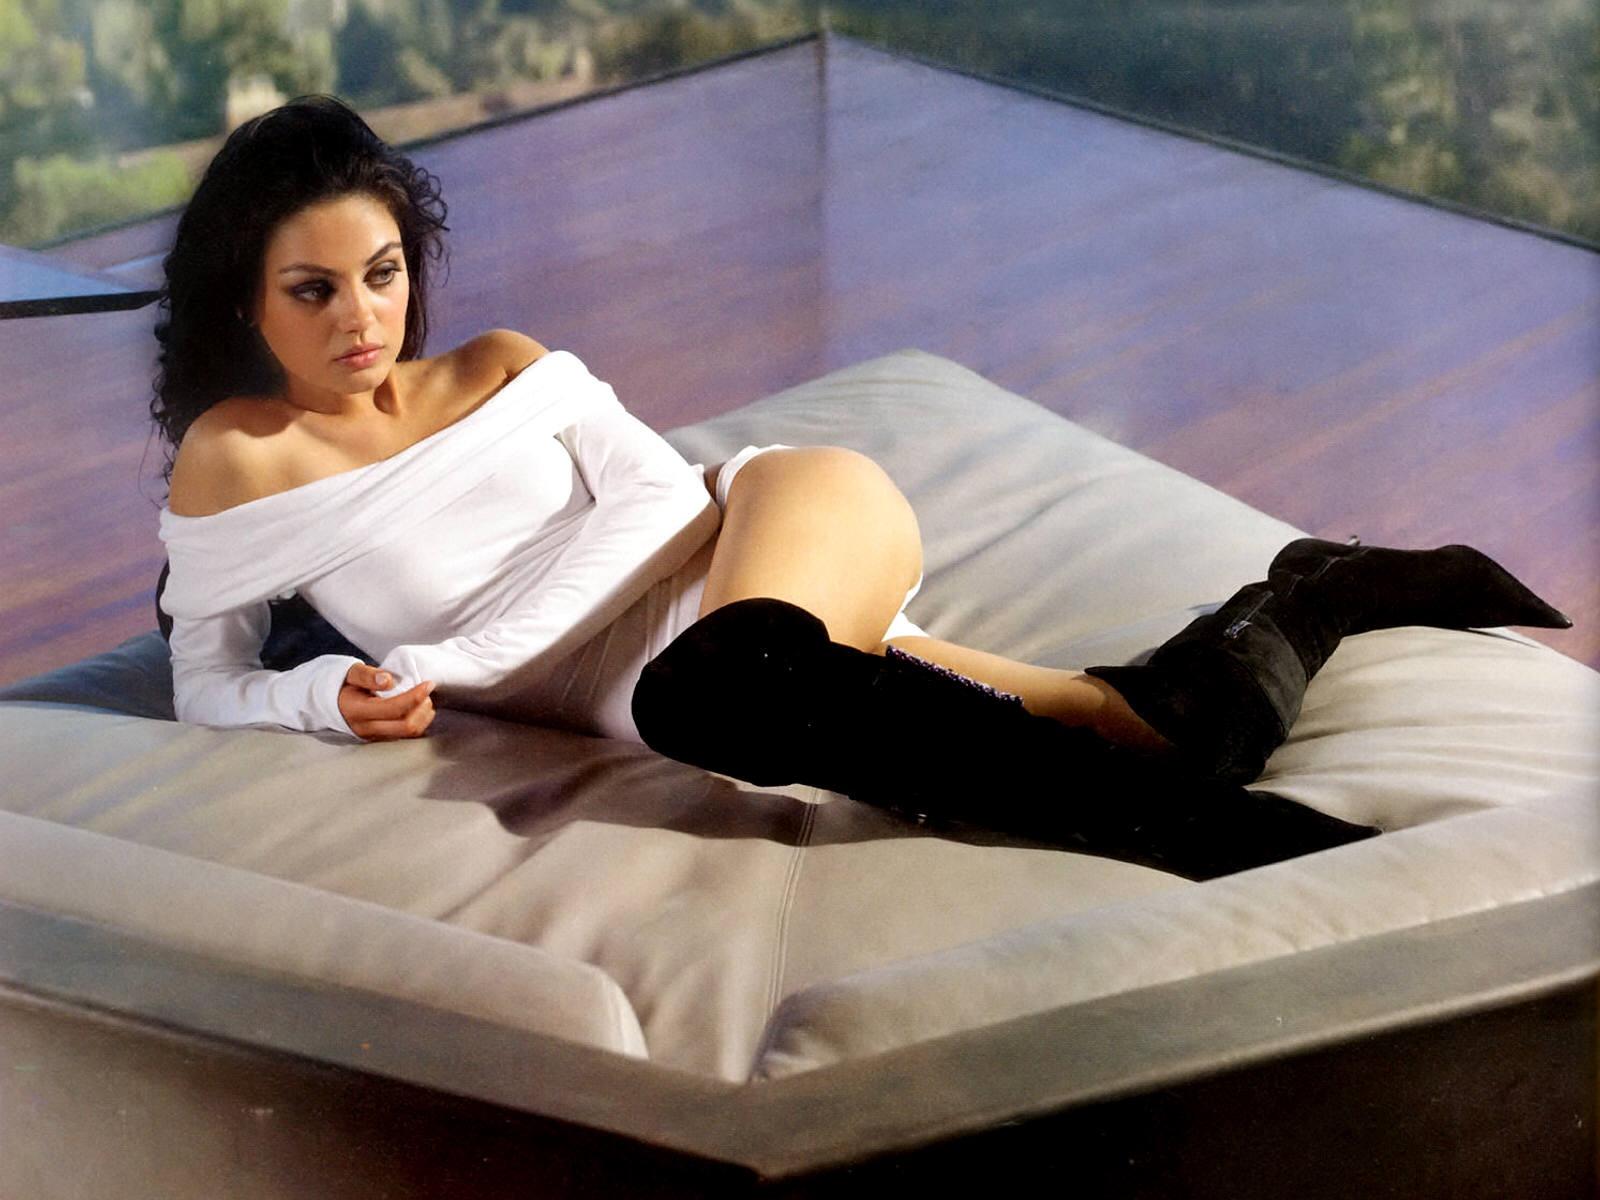 best-hot-sexy-Mila-Kunis-wallpaper-22.jpg (1600×1200)